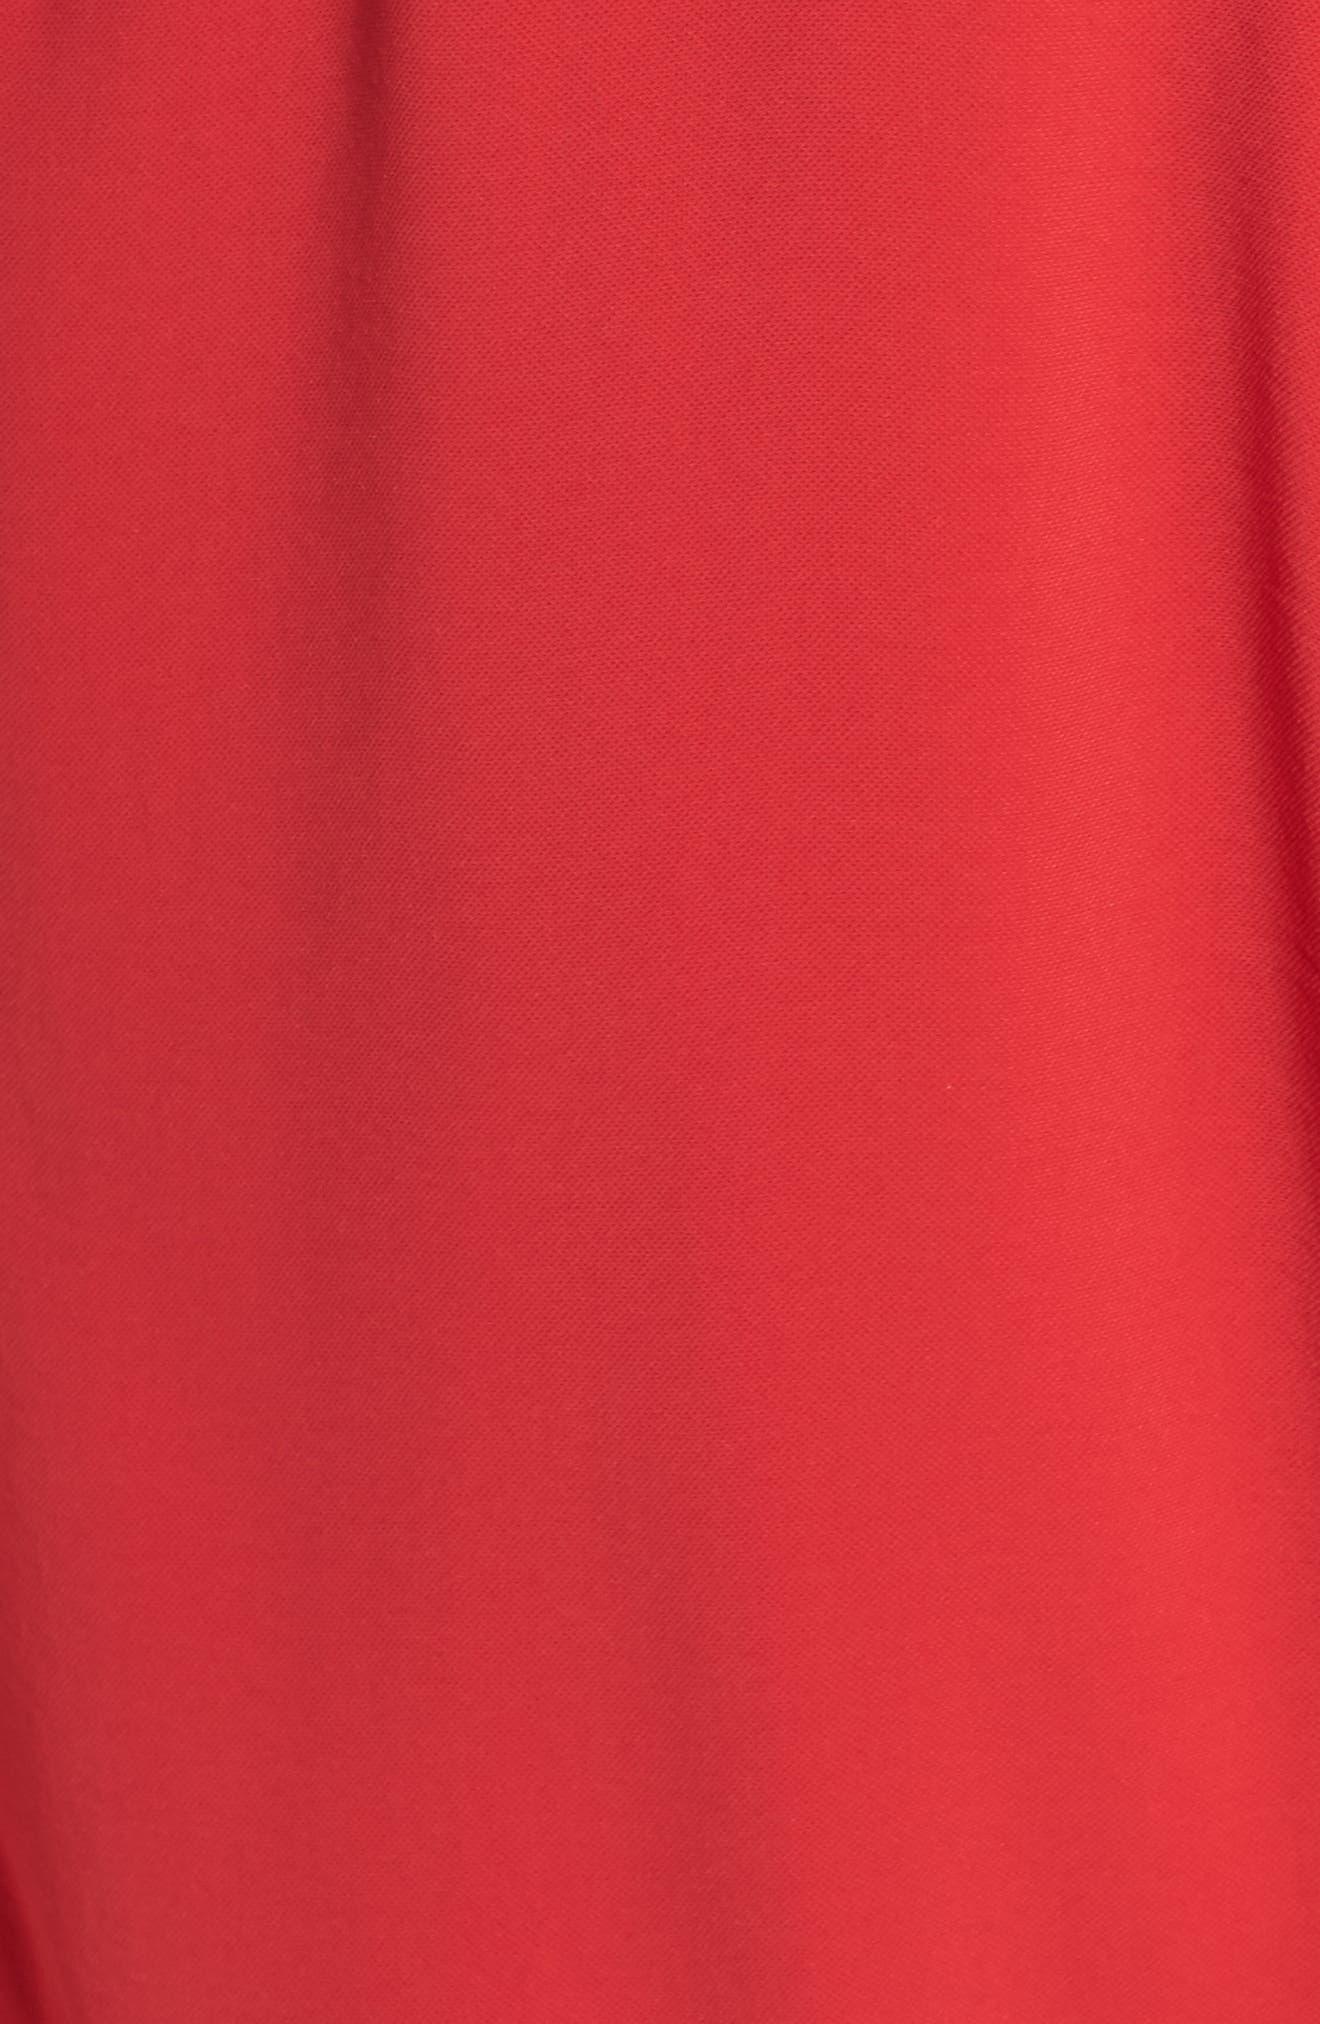 Crepe Flutter Sleeve Dress,                             Alternate thumbnail 5, color,                             Red Fire